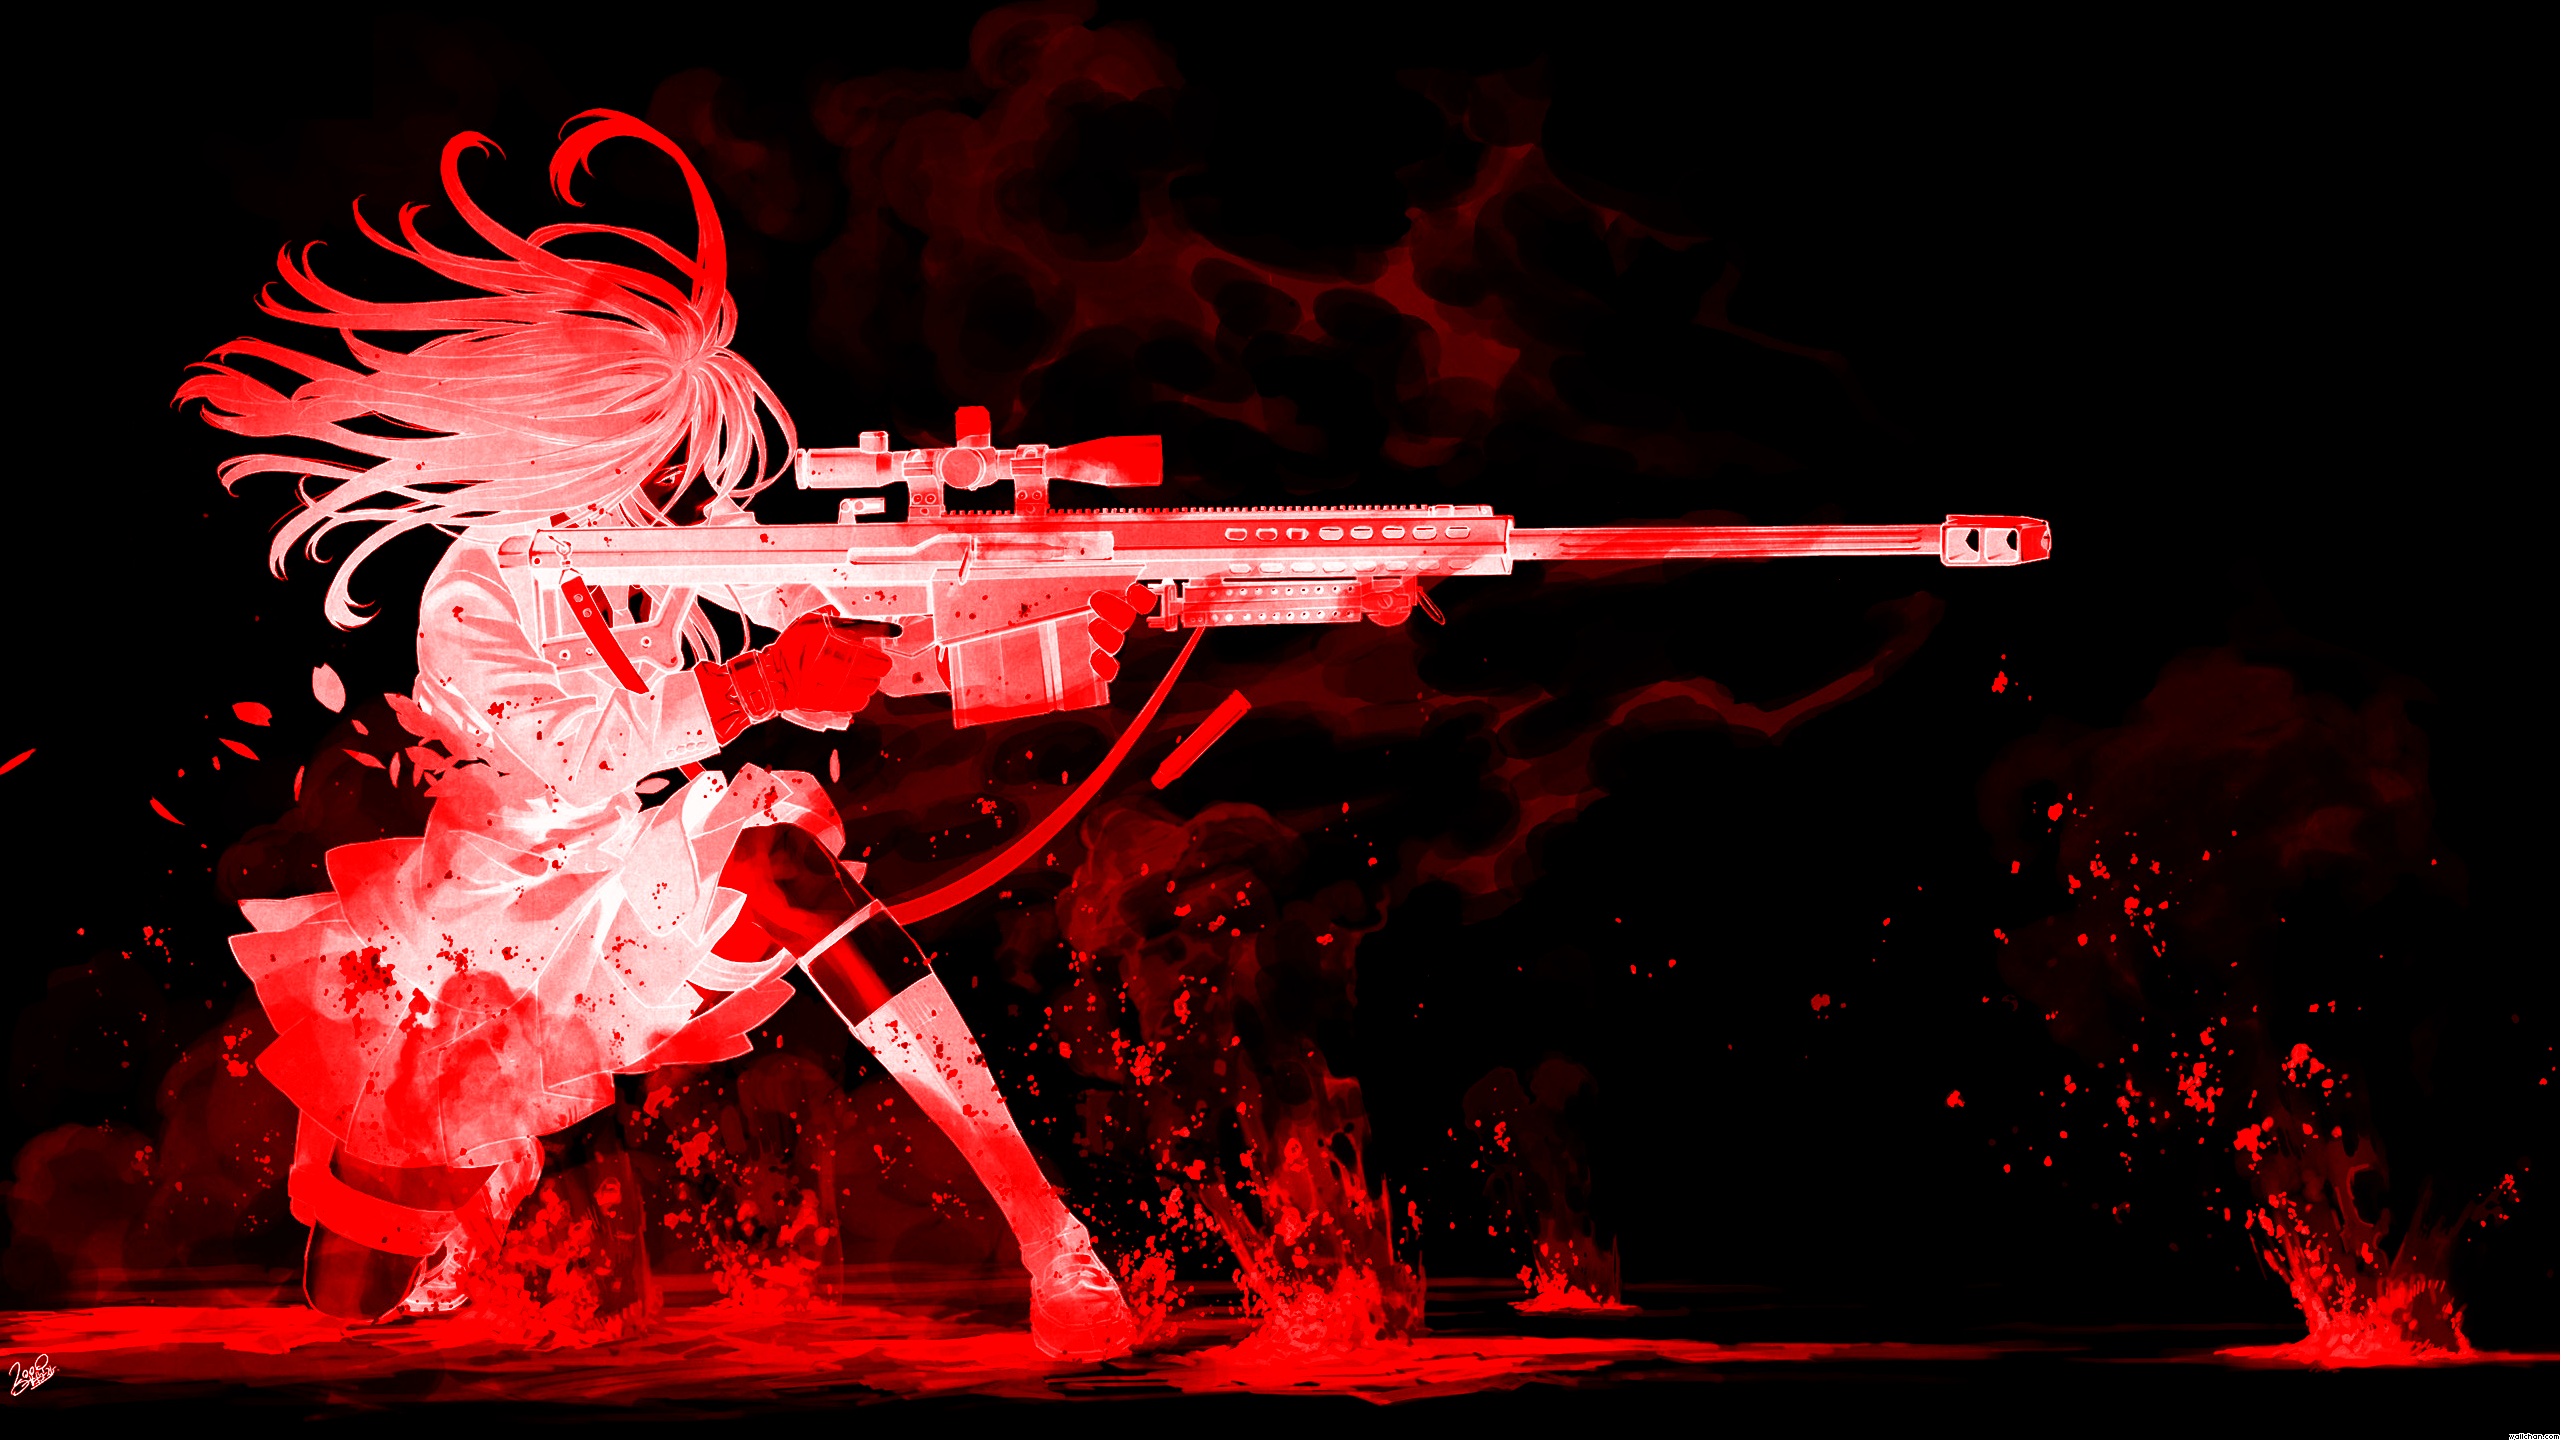 Sniper Wallpapers Hd wallpaper   1366335 2560x1440